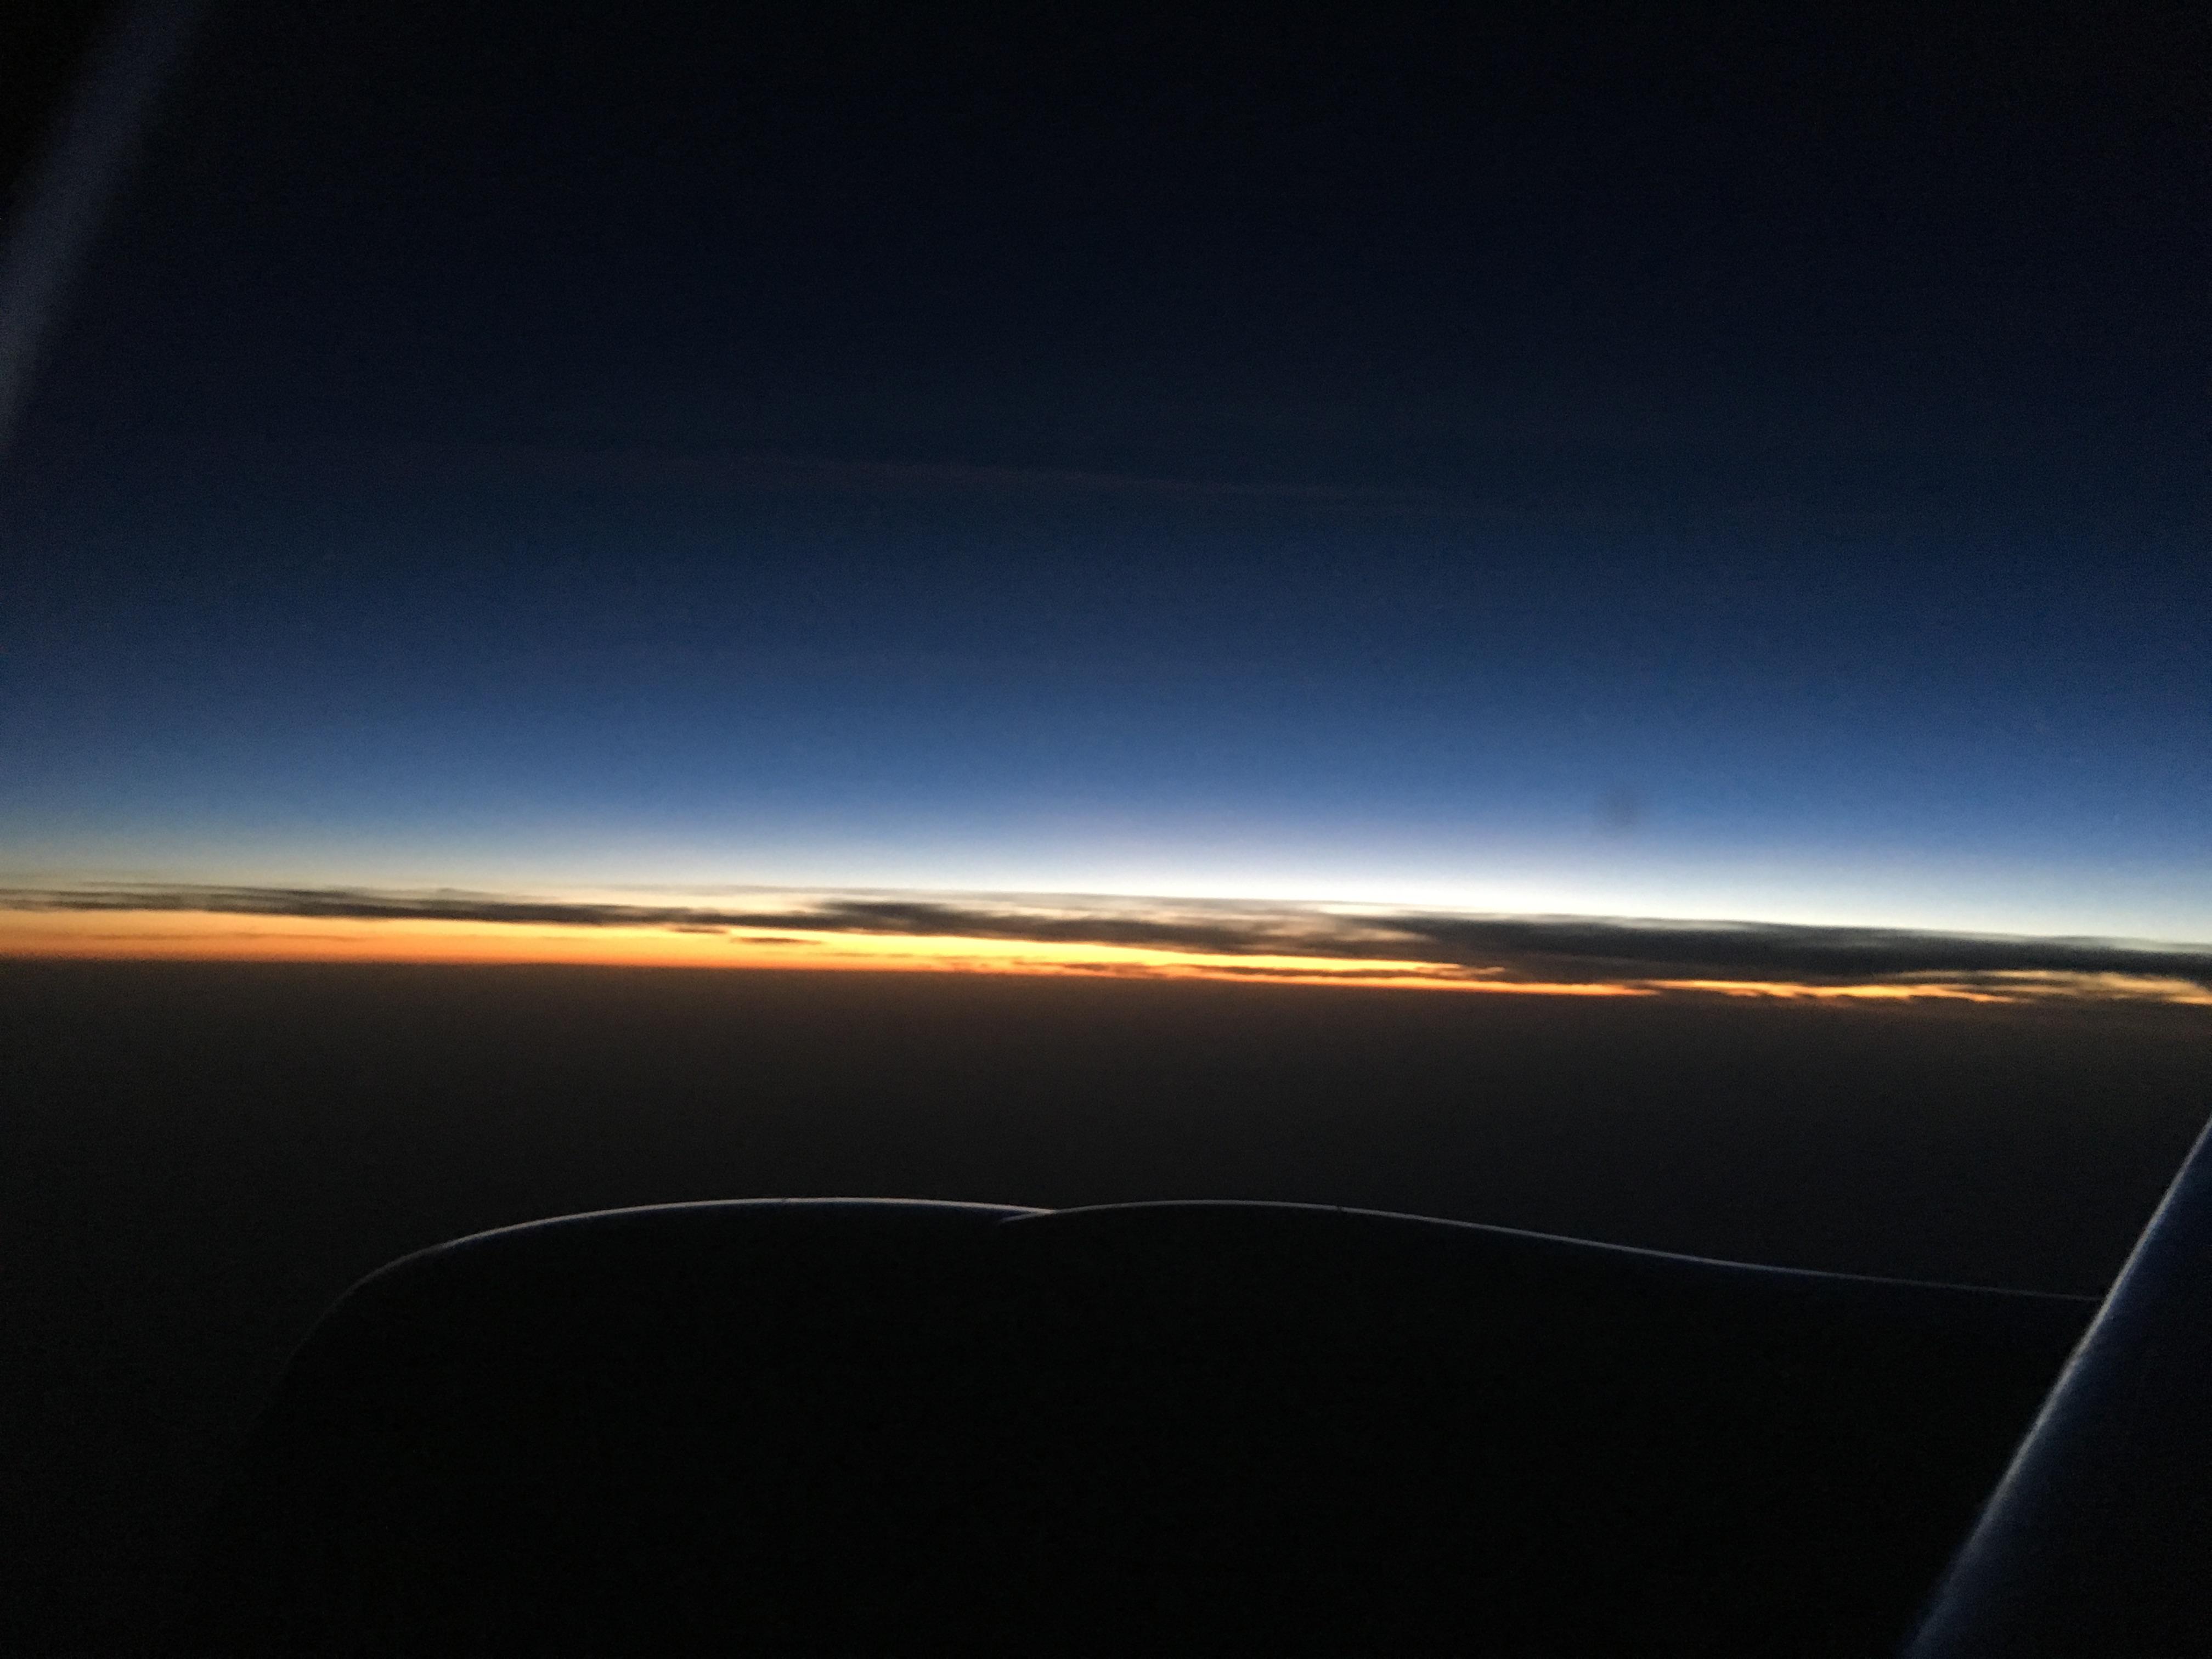 Monique Lhuillier travel diary: Goodbye Qatar!